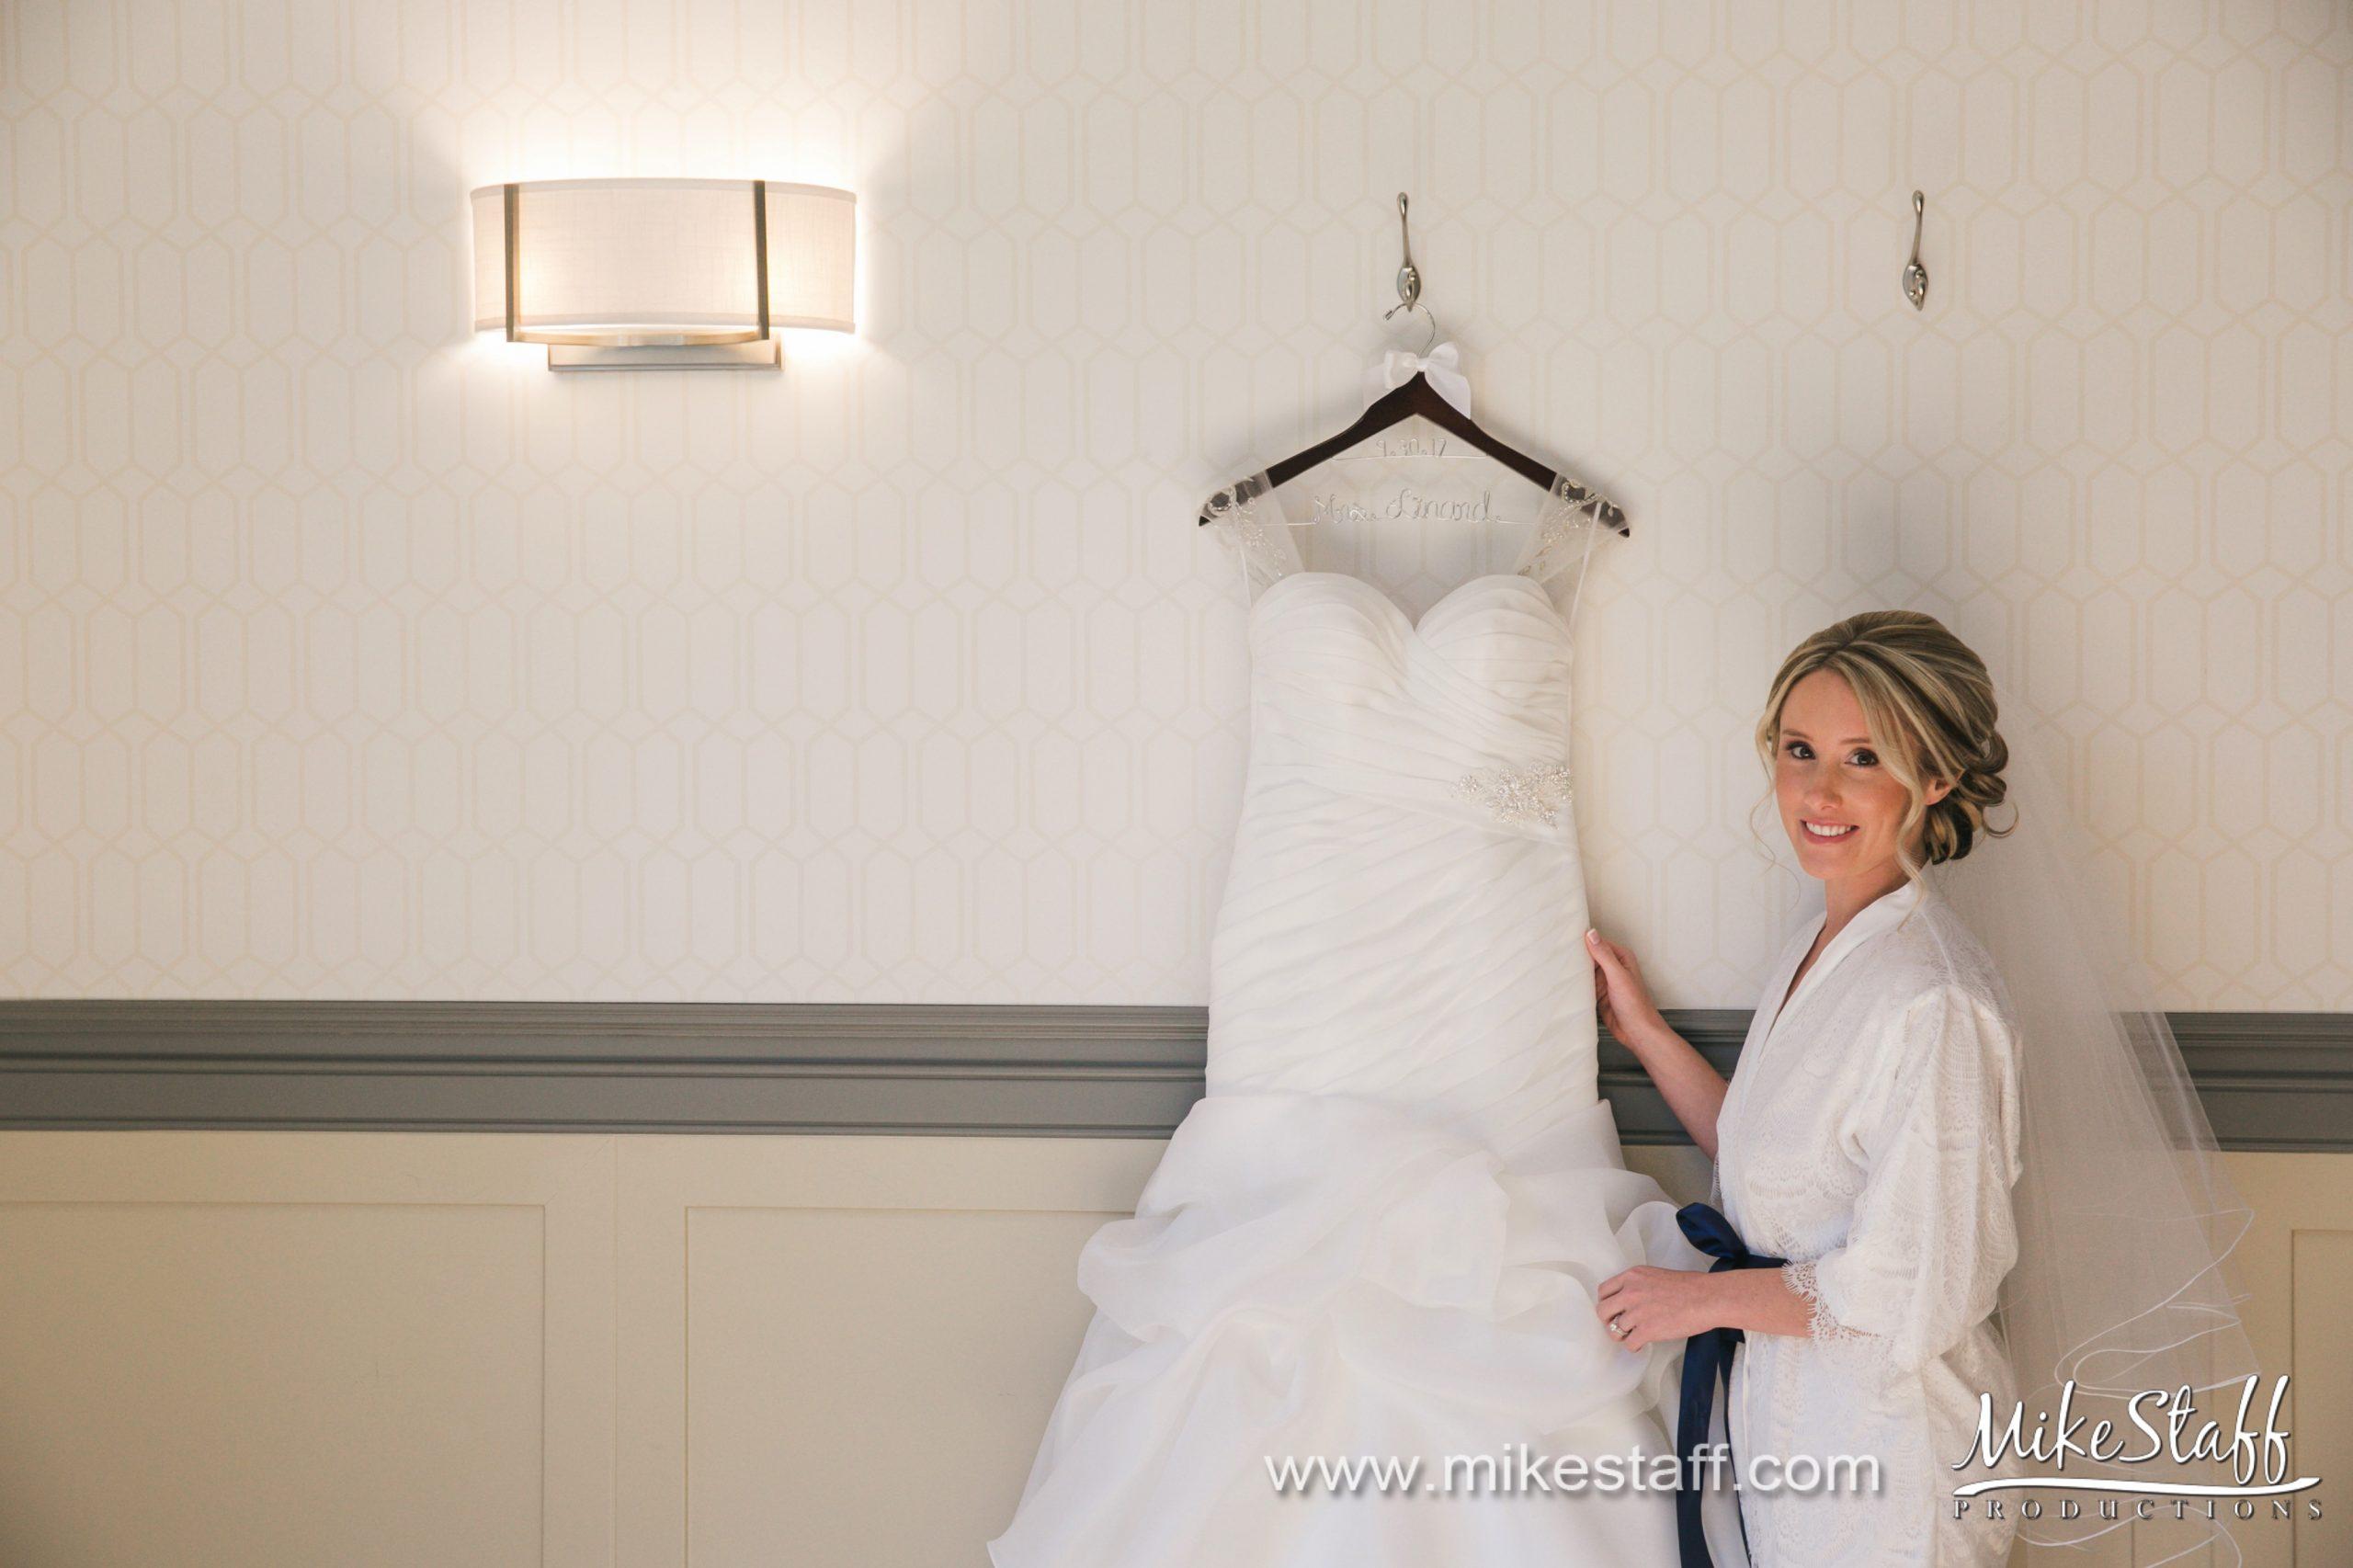 Danielle's Wedding Dress